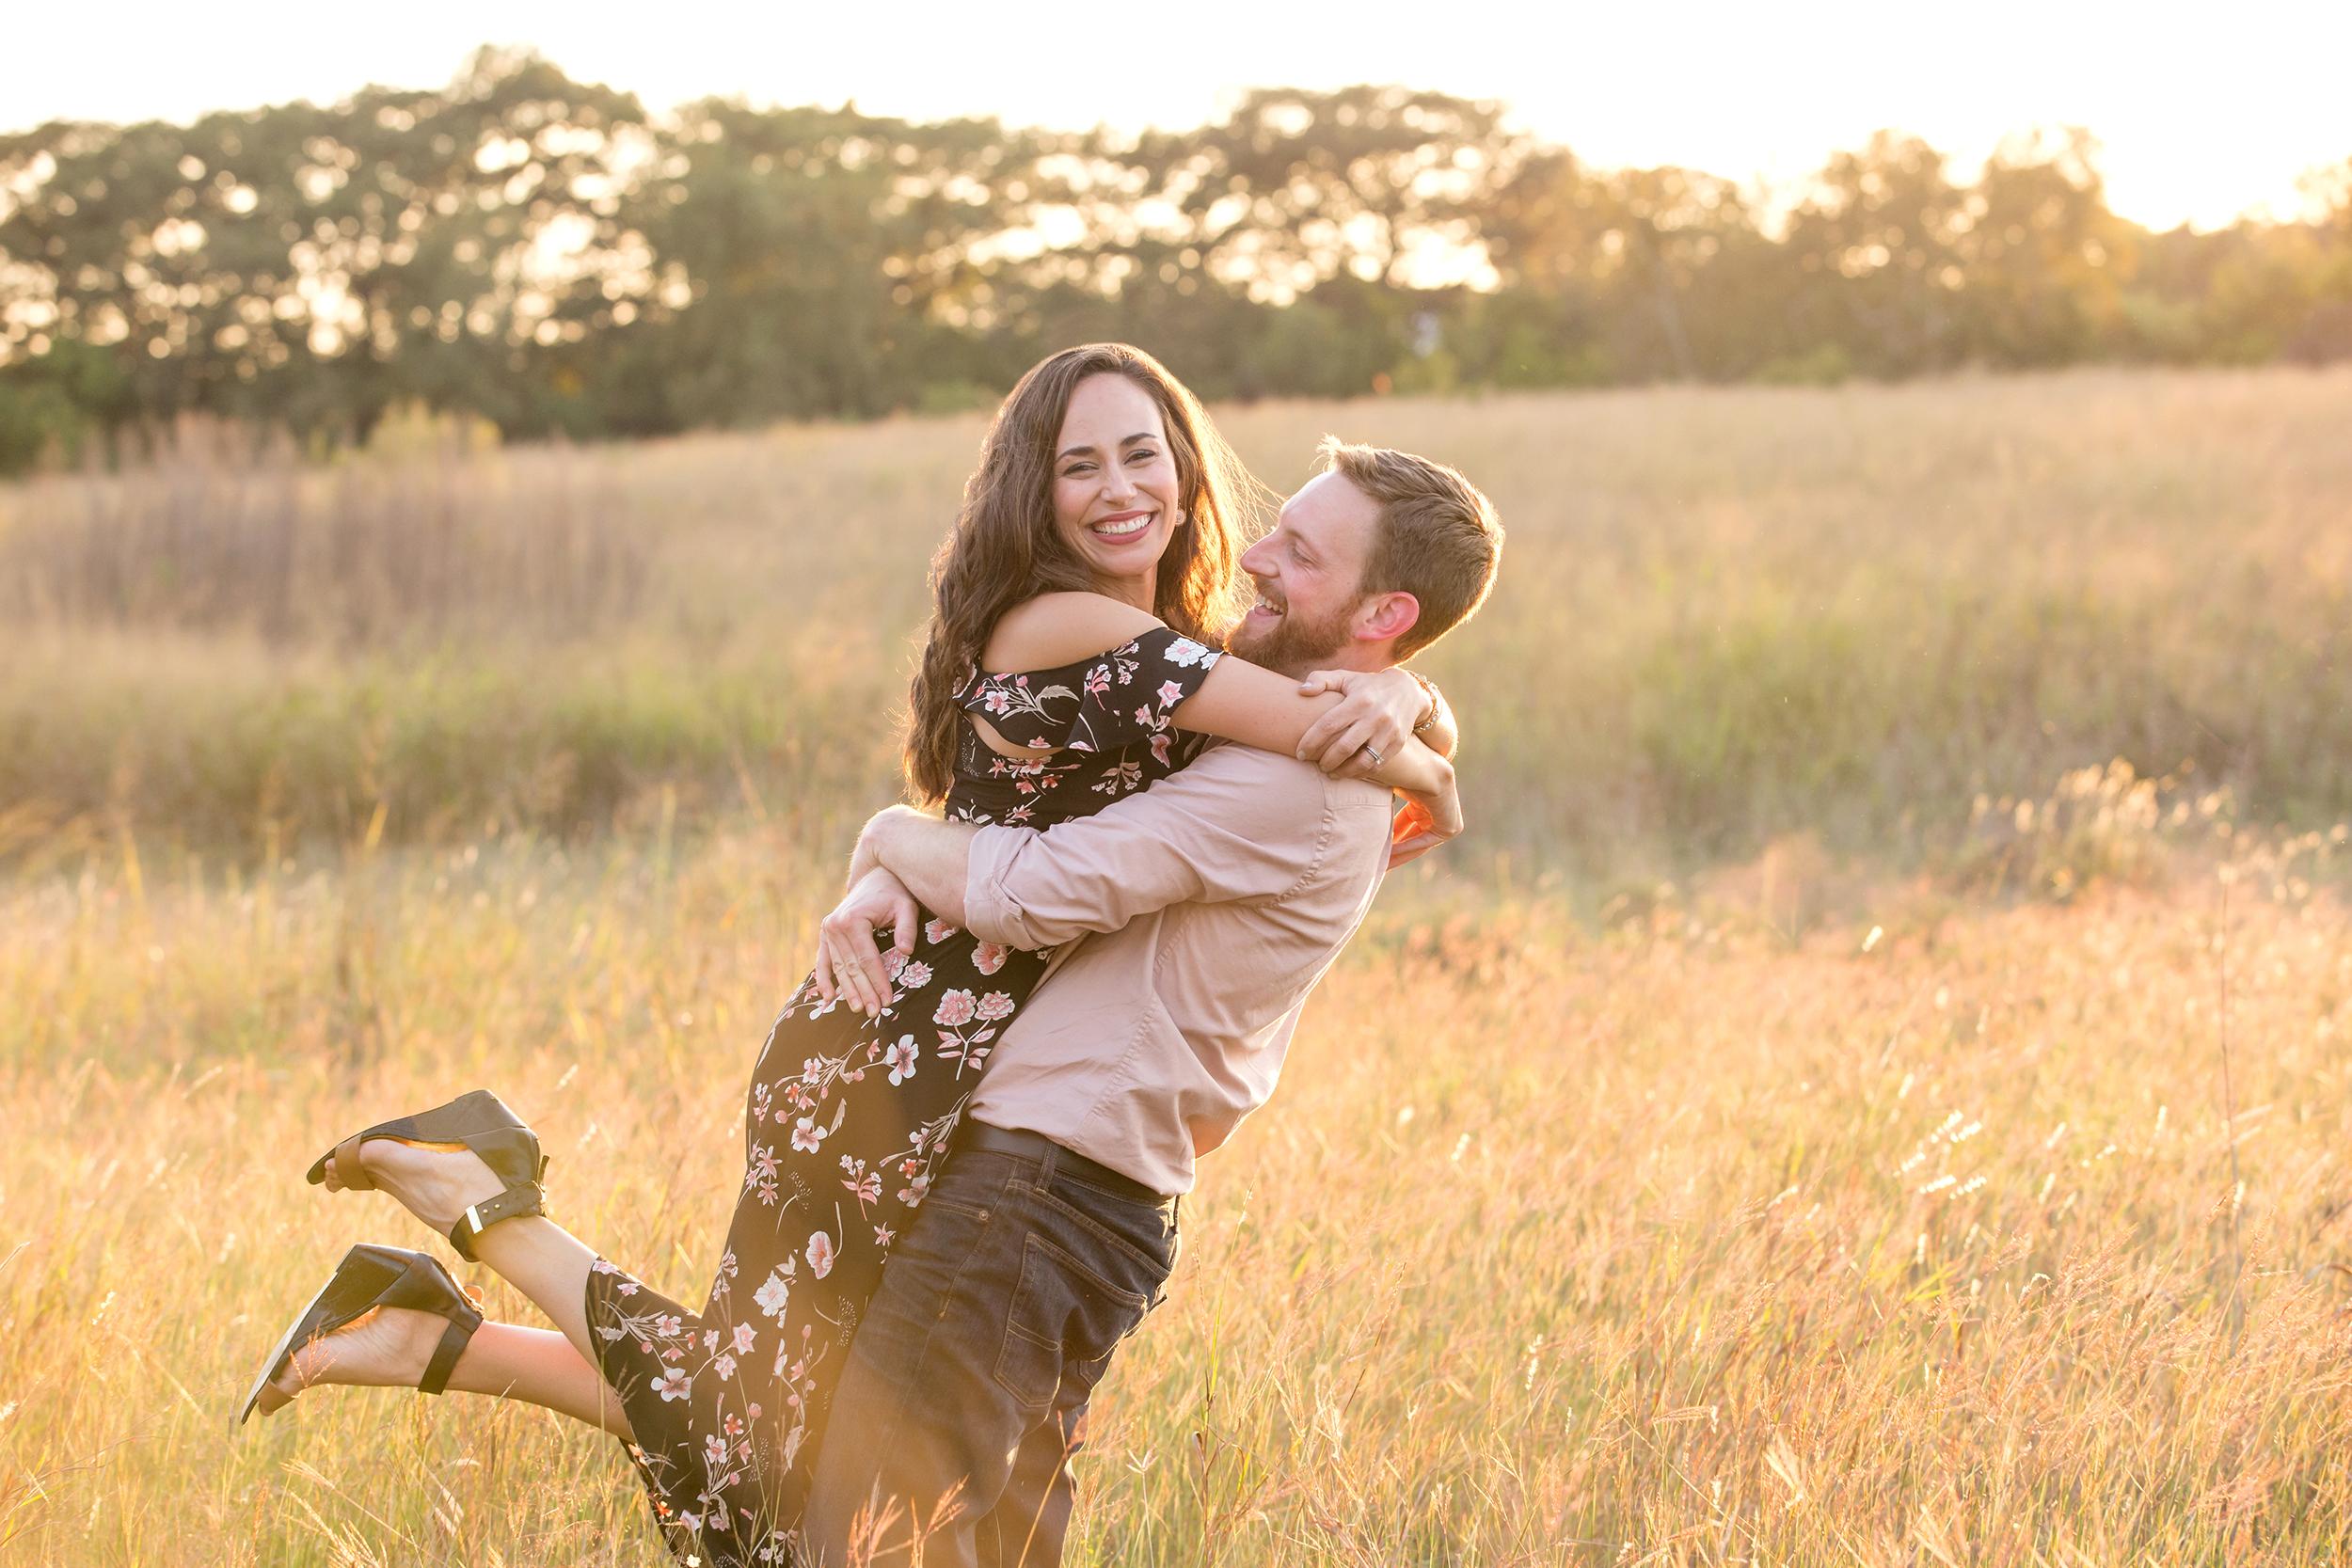 Couple-grass-field-smiling-hugging.jpg